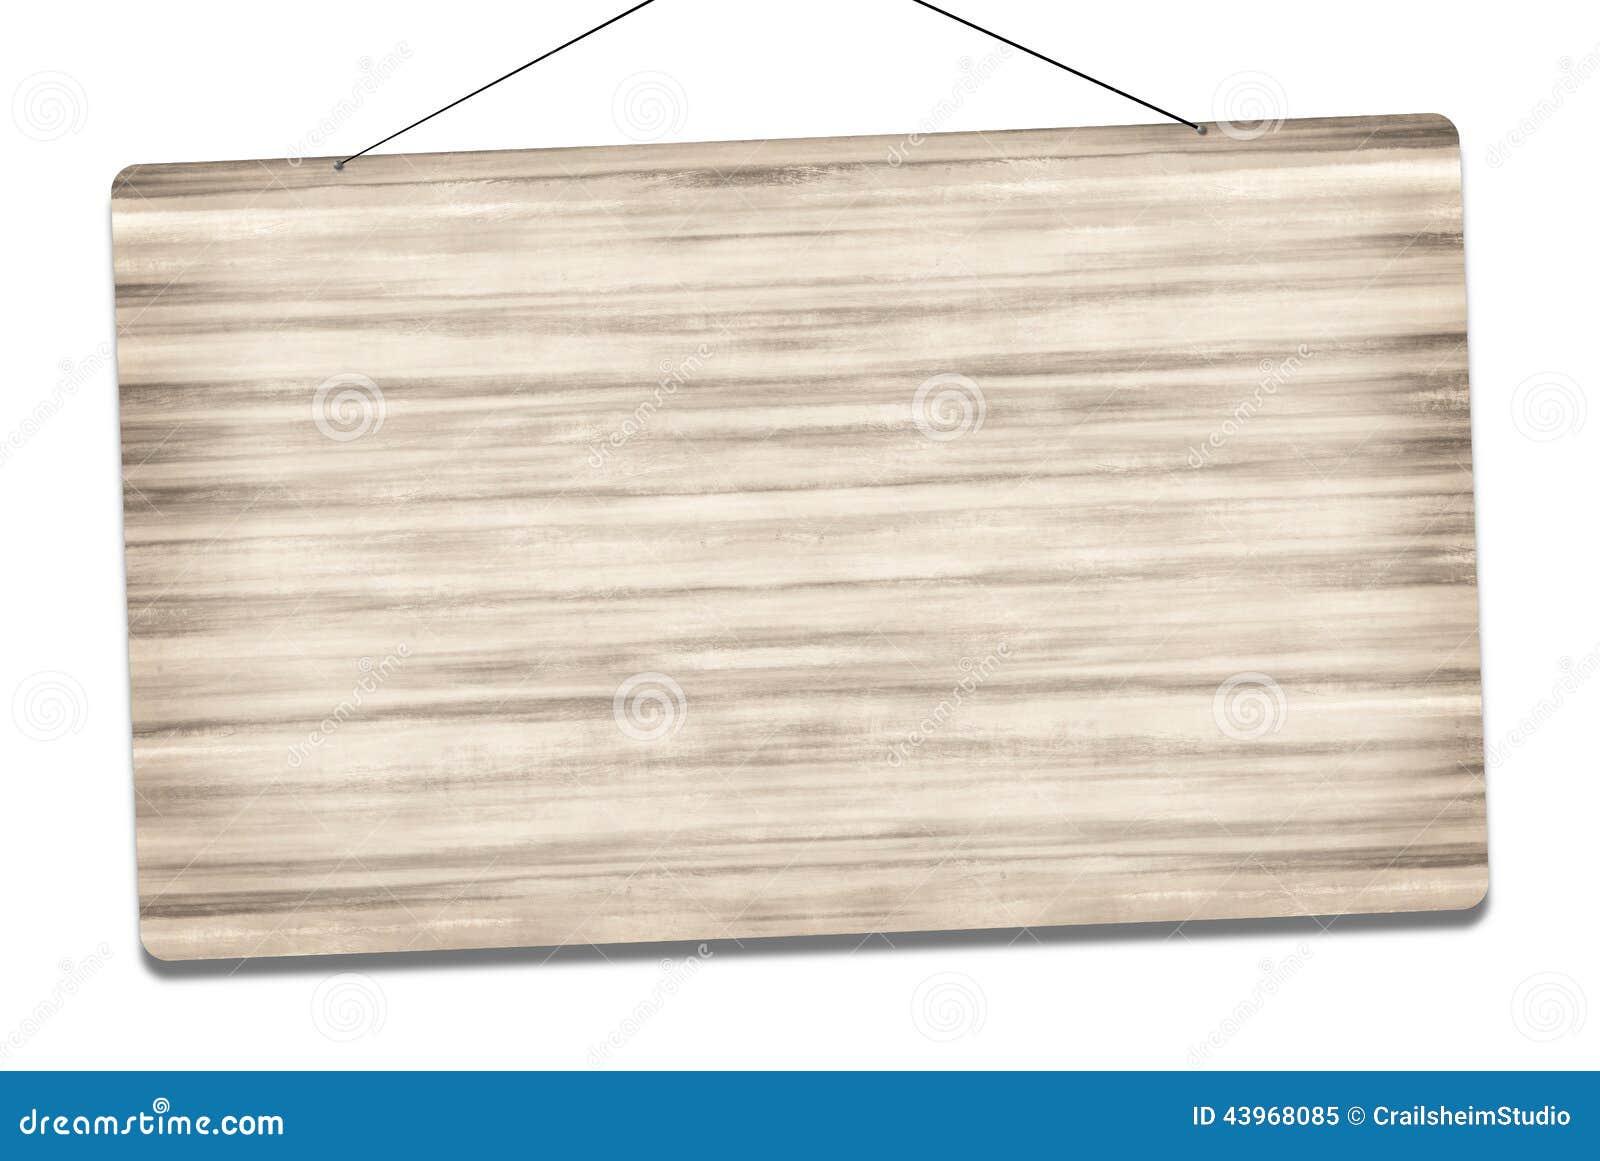 Blank Wood Sign Stock Illustration - Image: 43968085